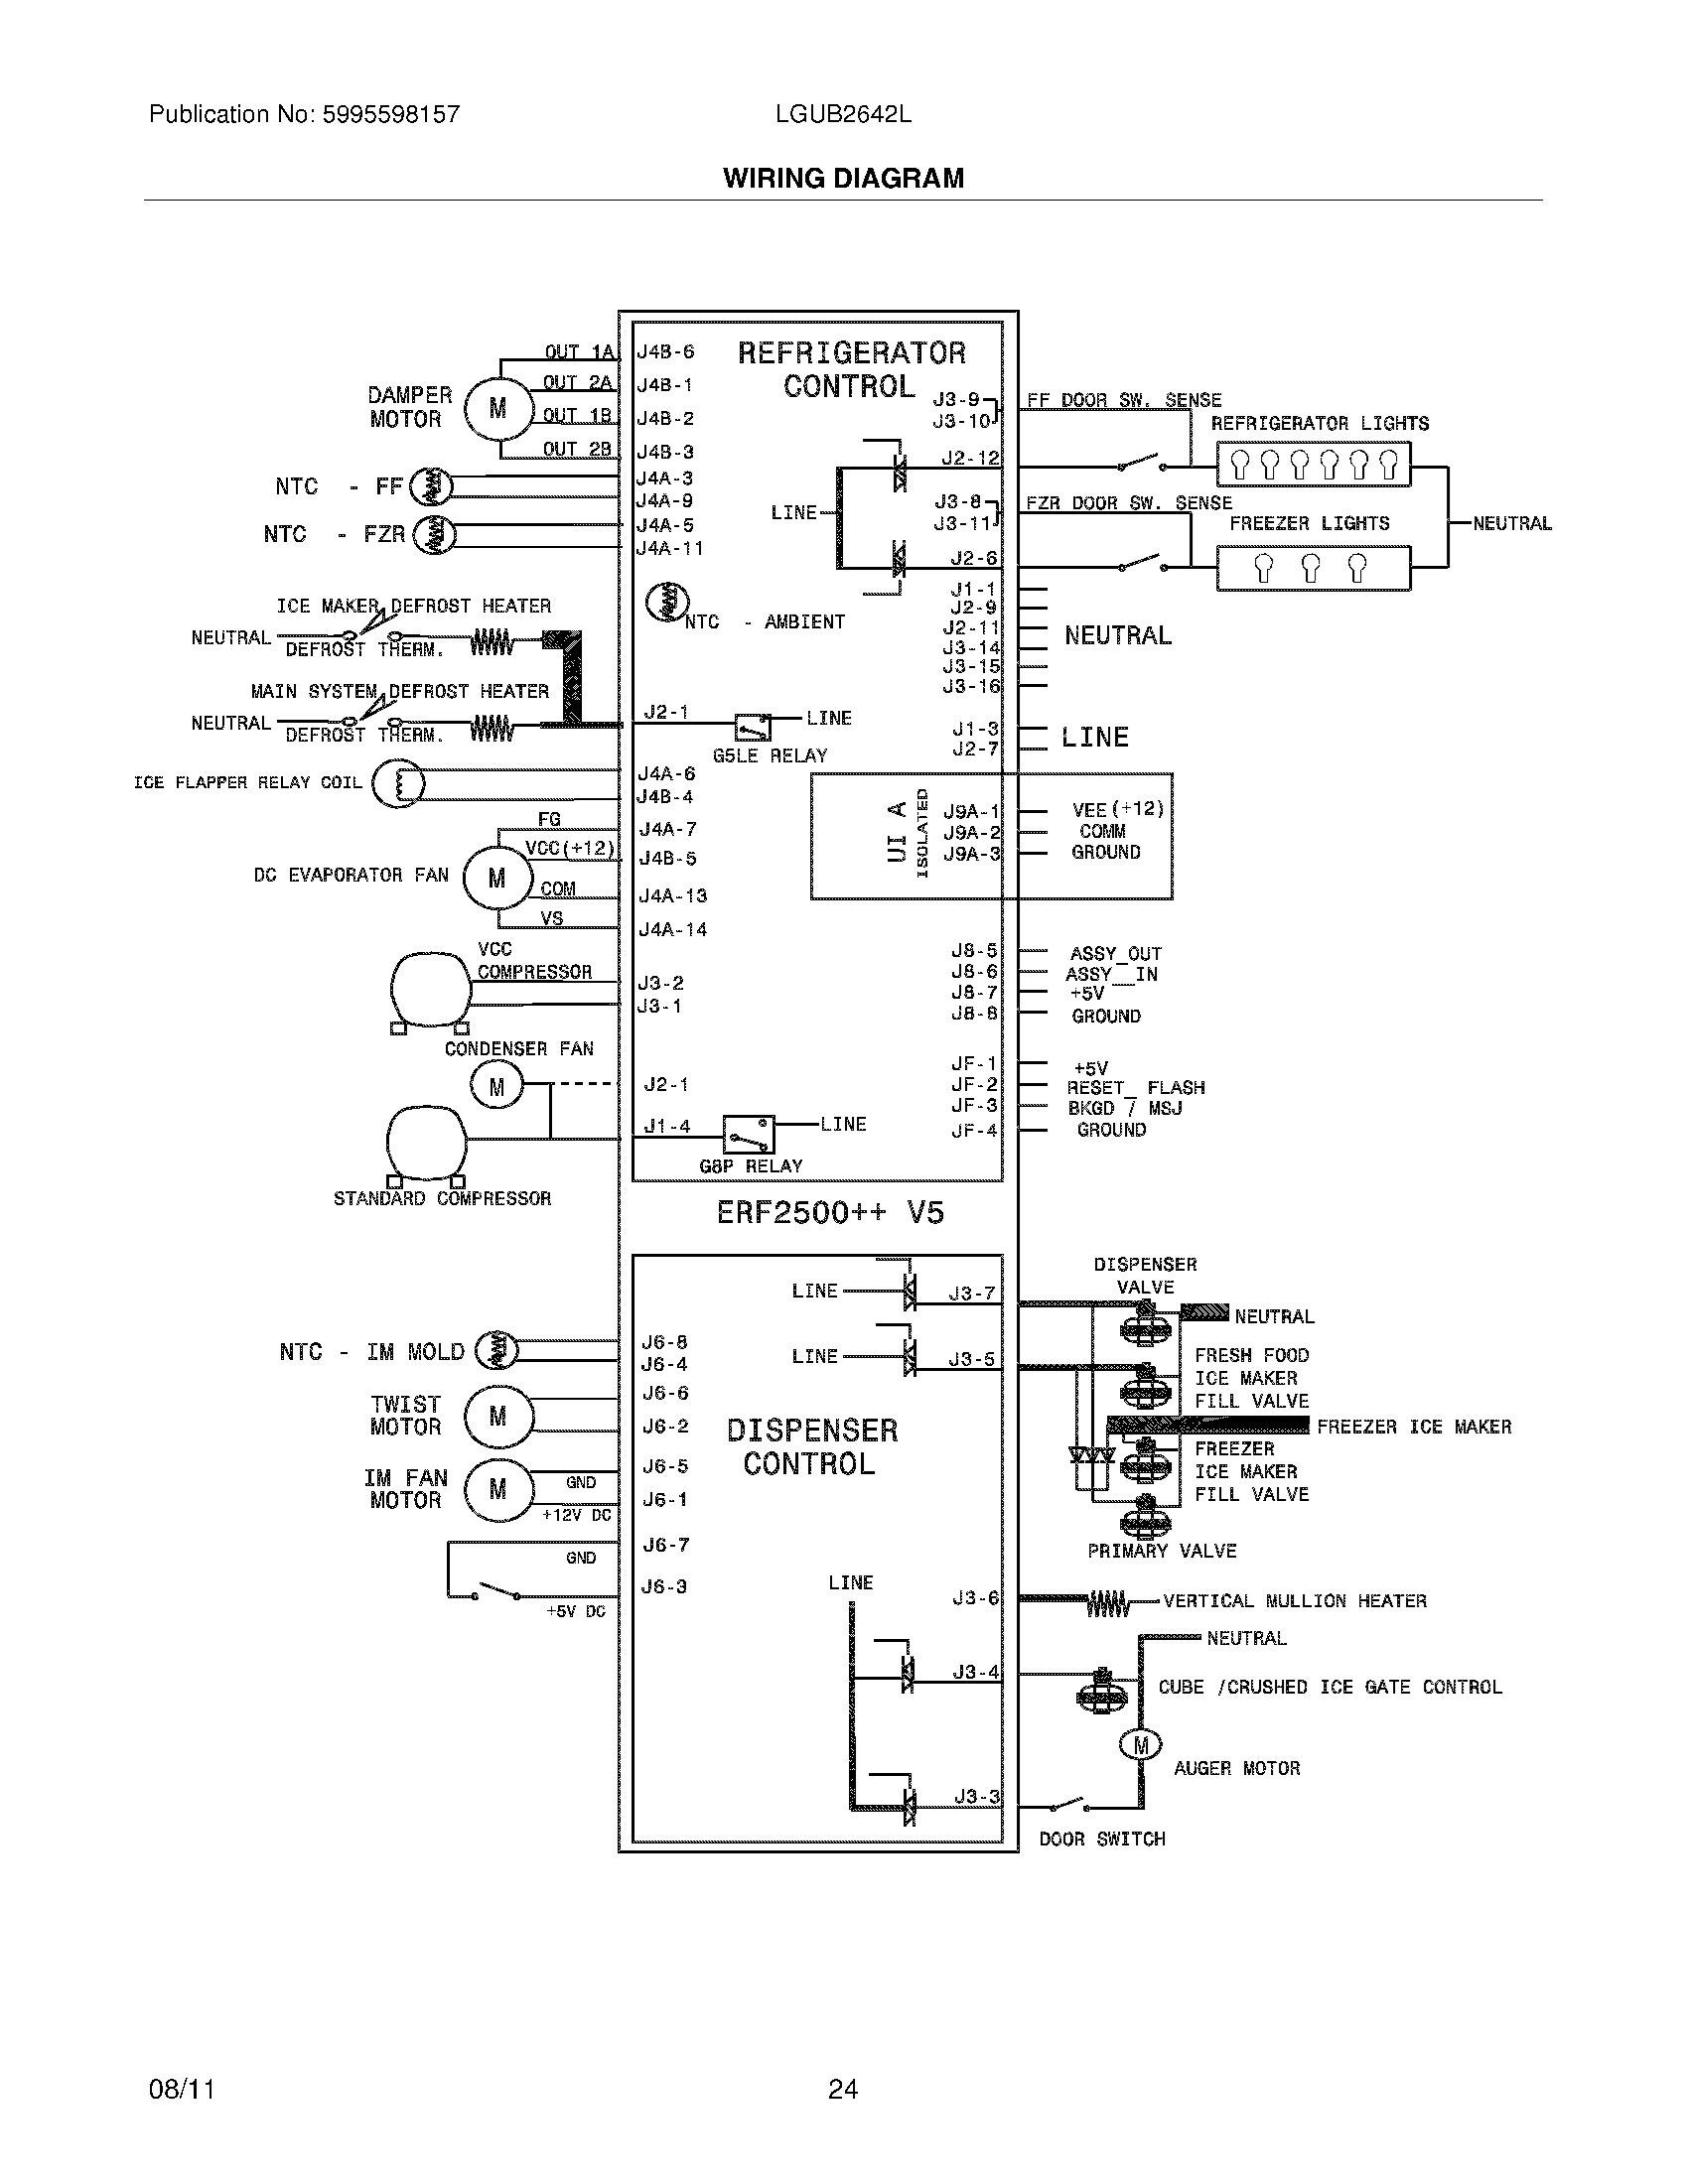 ElectroluxImg_19000101 20150717_00134740?width=1000 frs26zrg wiring diagram pdf frs26zrg wiring diagrams collection  at edmiracle.co